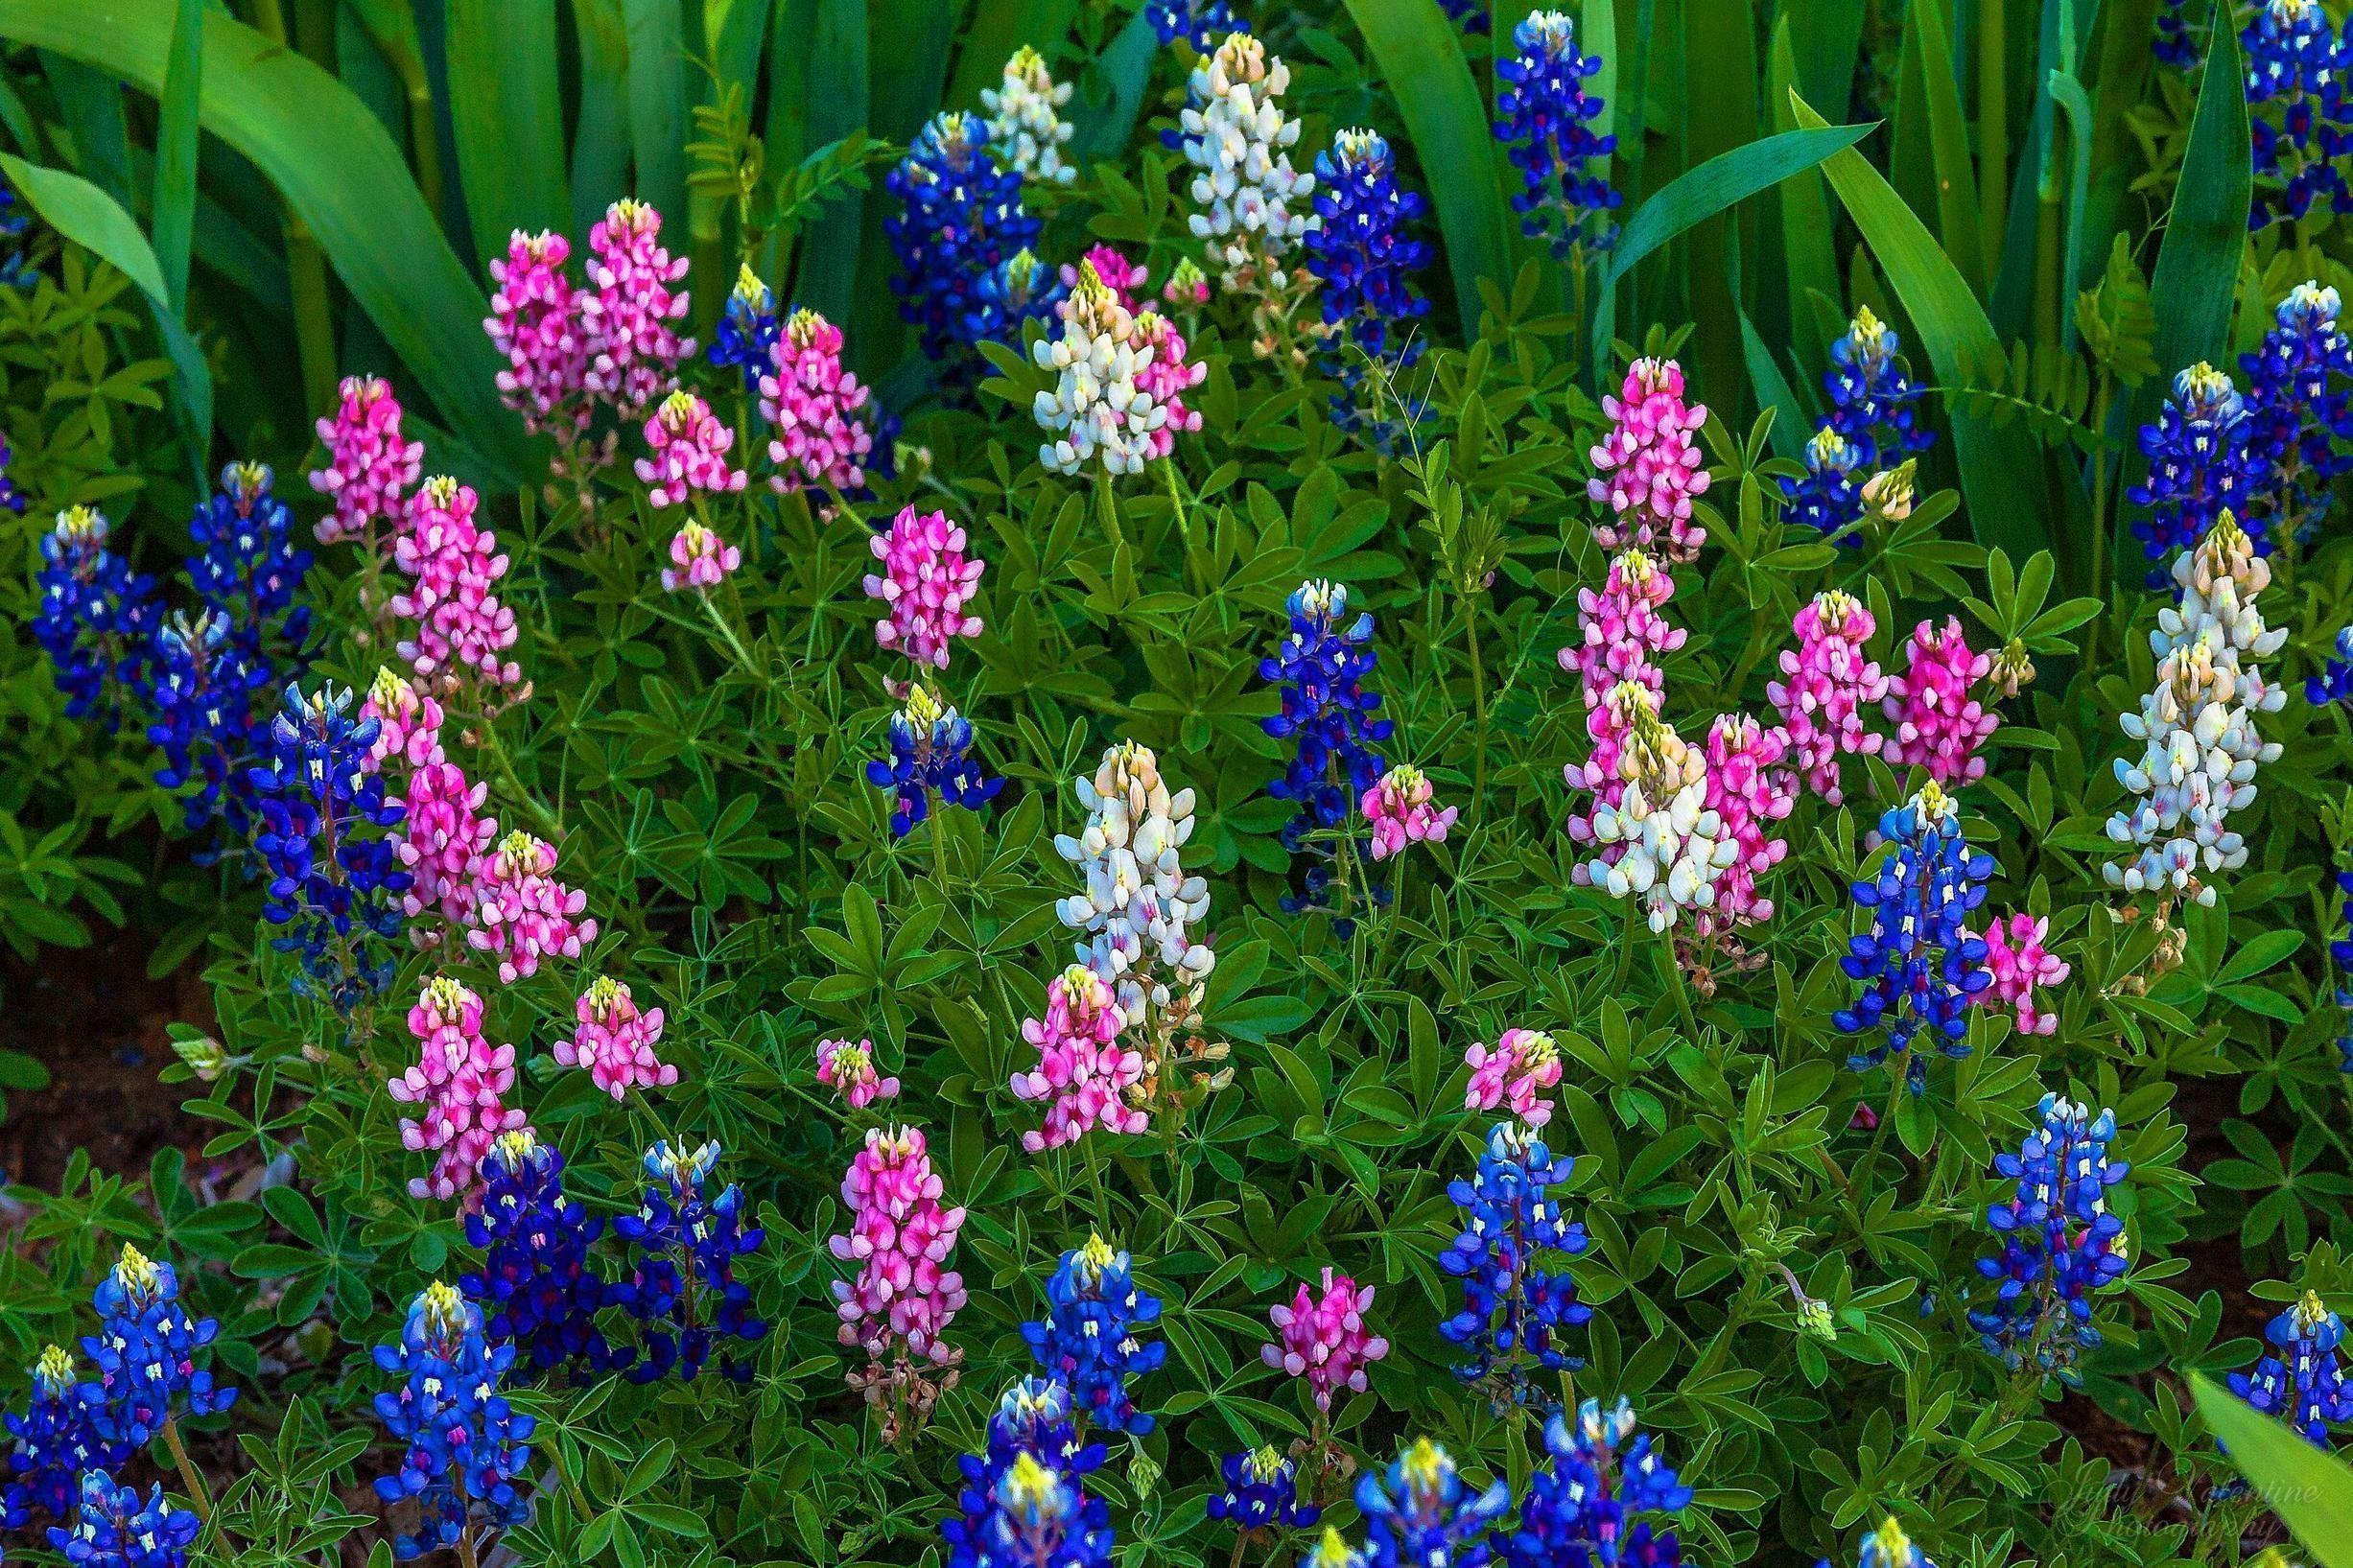 Res: 2453x1635, bluebonnet wallpapers wallpaper cave, Beautiful flower